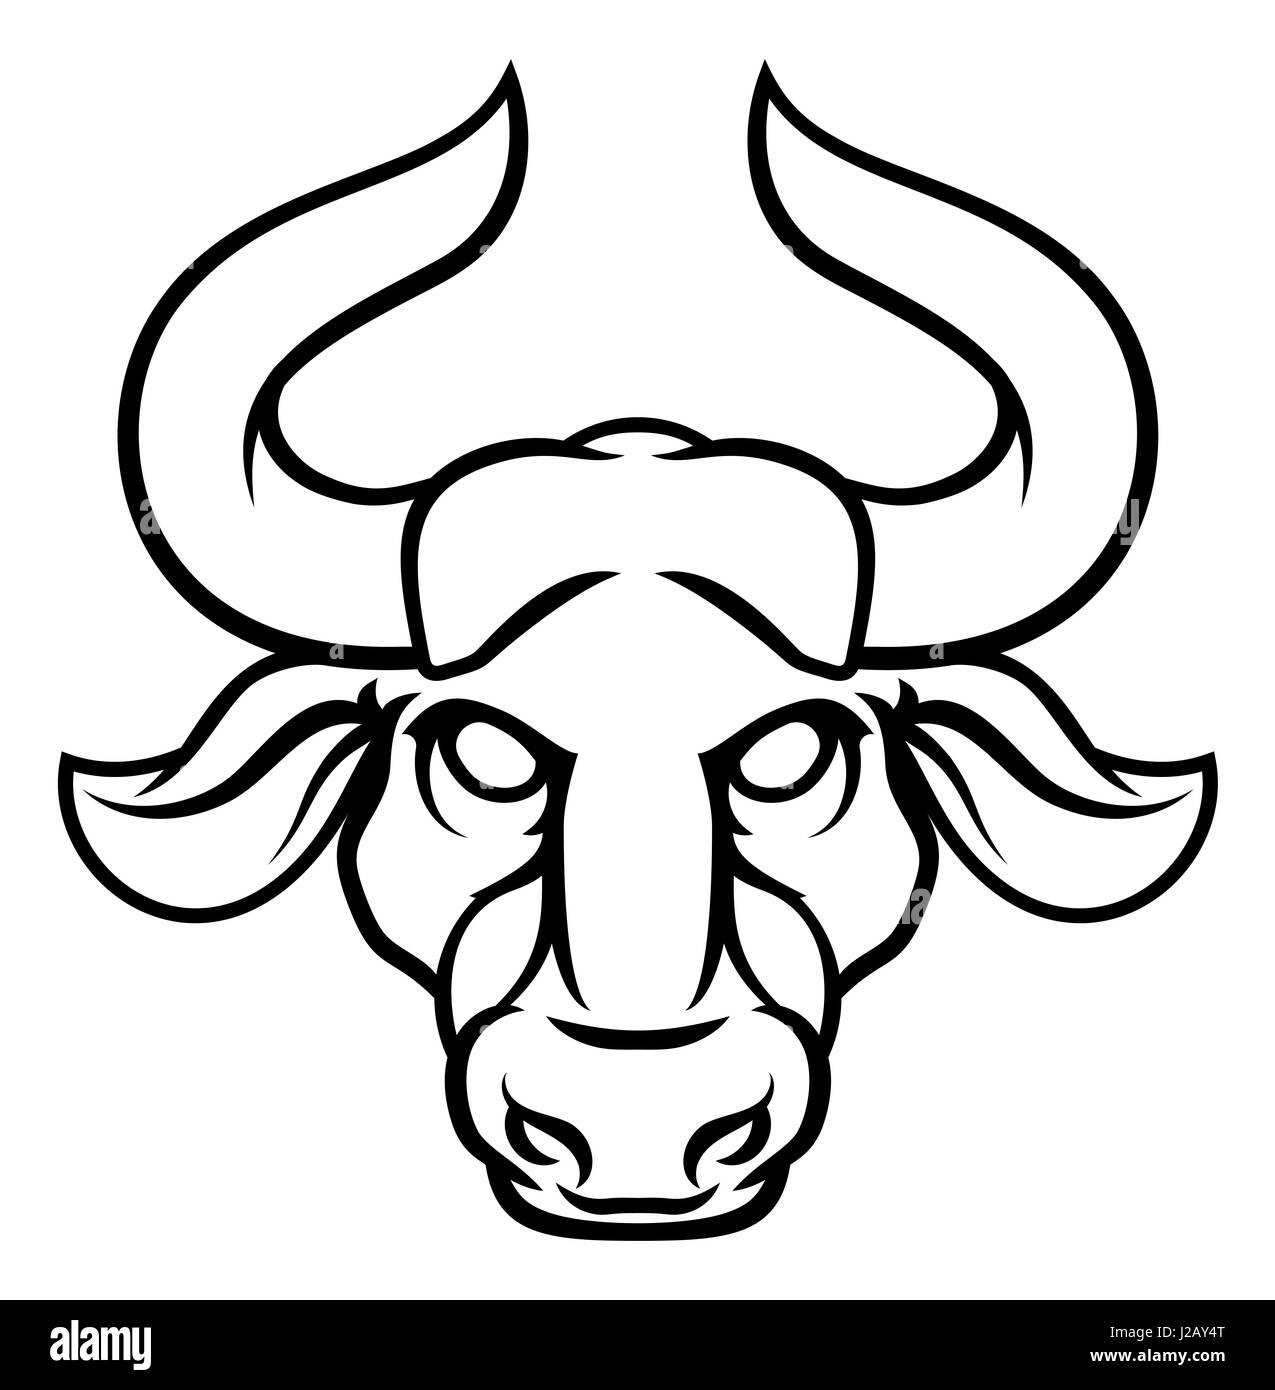 Astrology horoscope zodiac signs, circular Taurus bull symbol - Stock Image